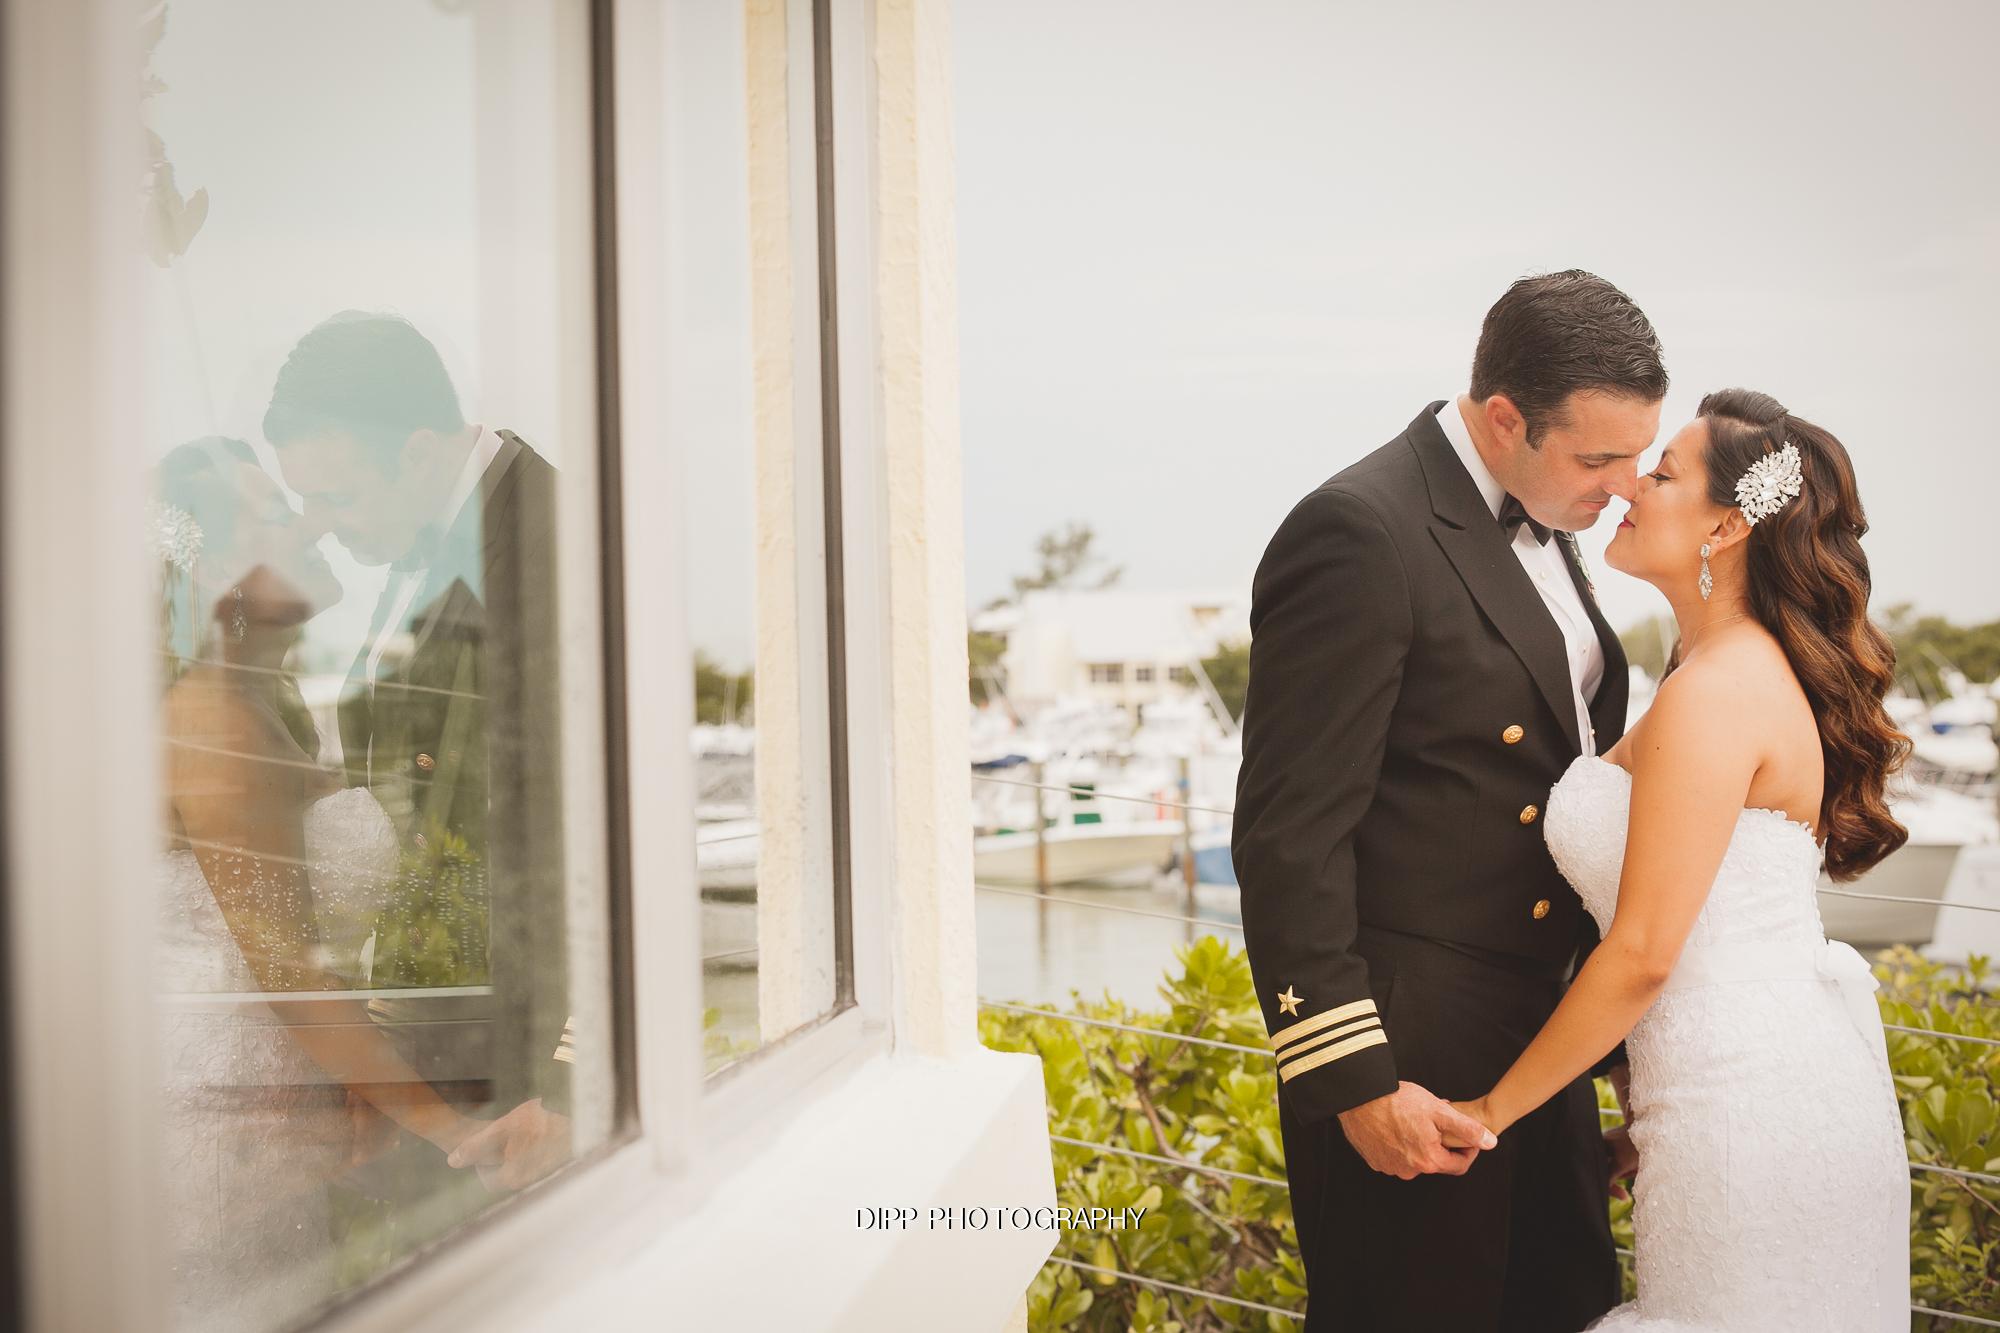 Dipp_2016 EDITED Sara & Brandon Wedding-91